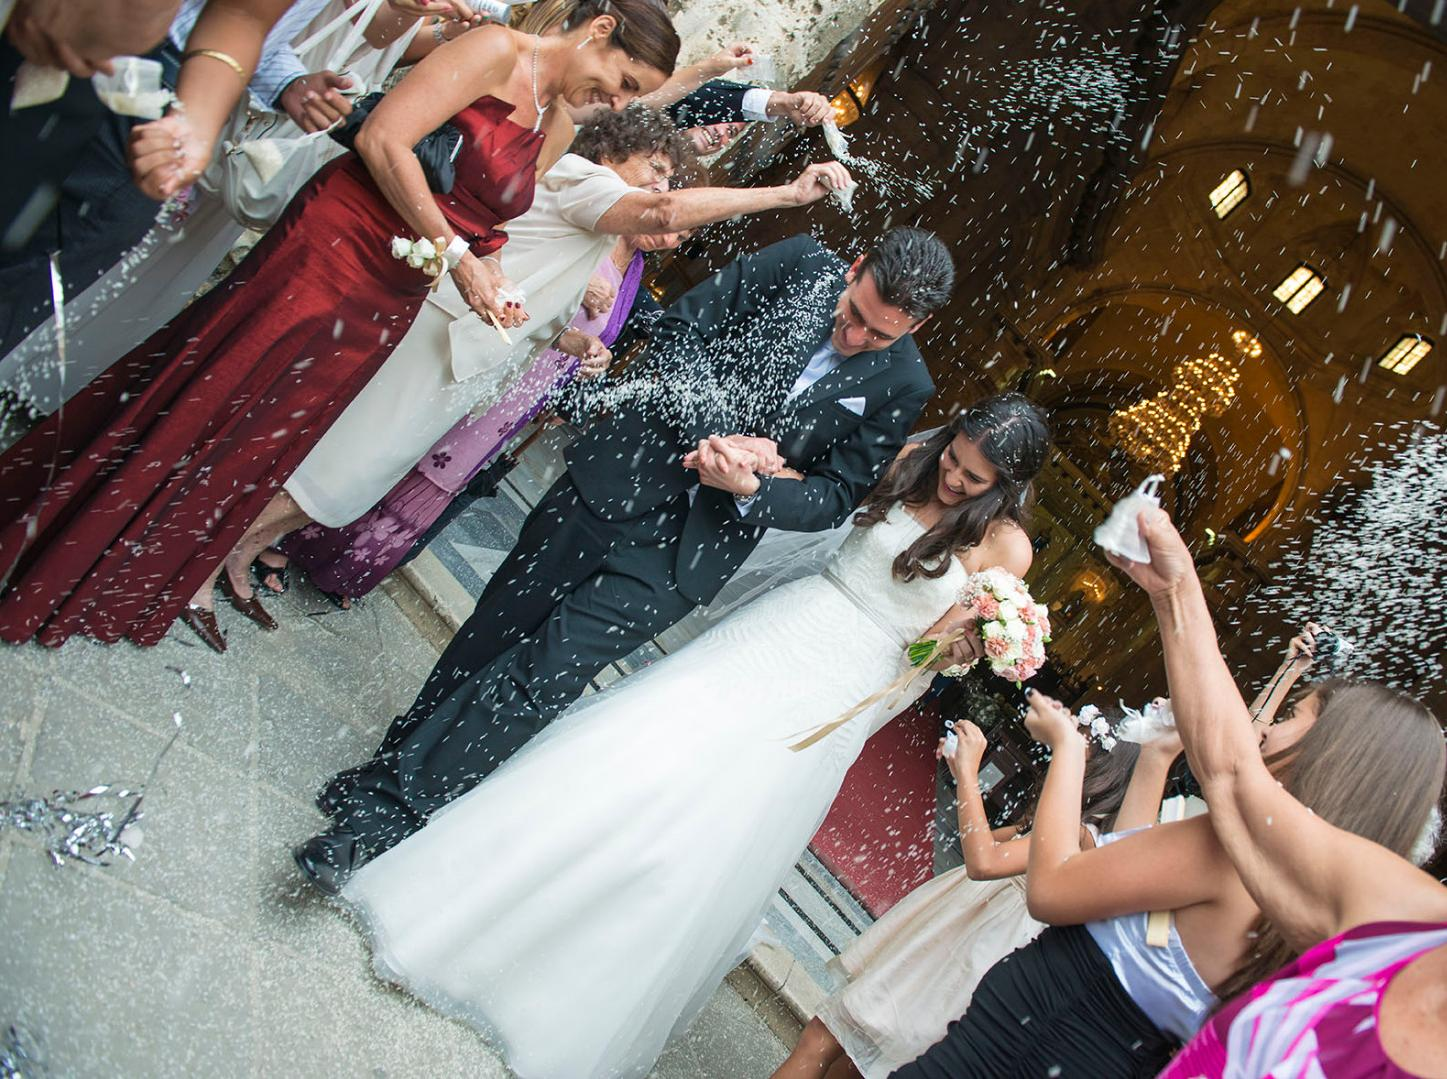 bodas-sin-clasificar-sin-tema-cuba-15042.jpg